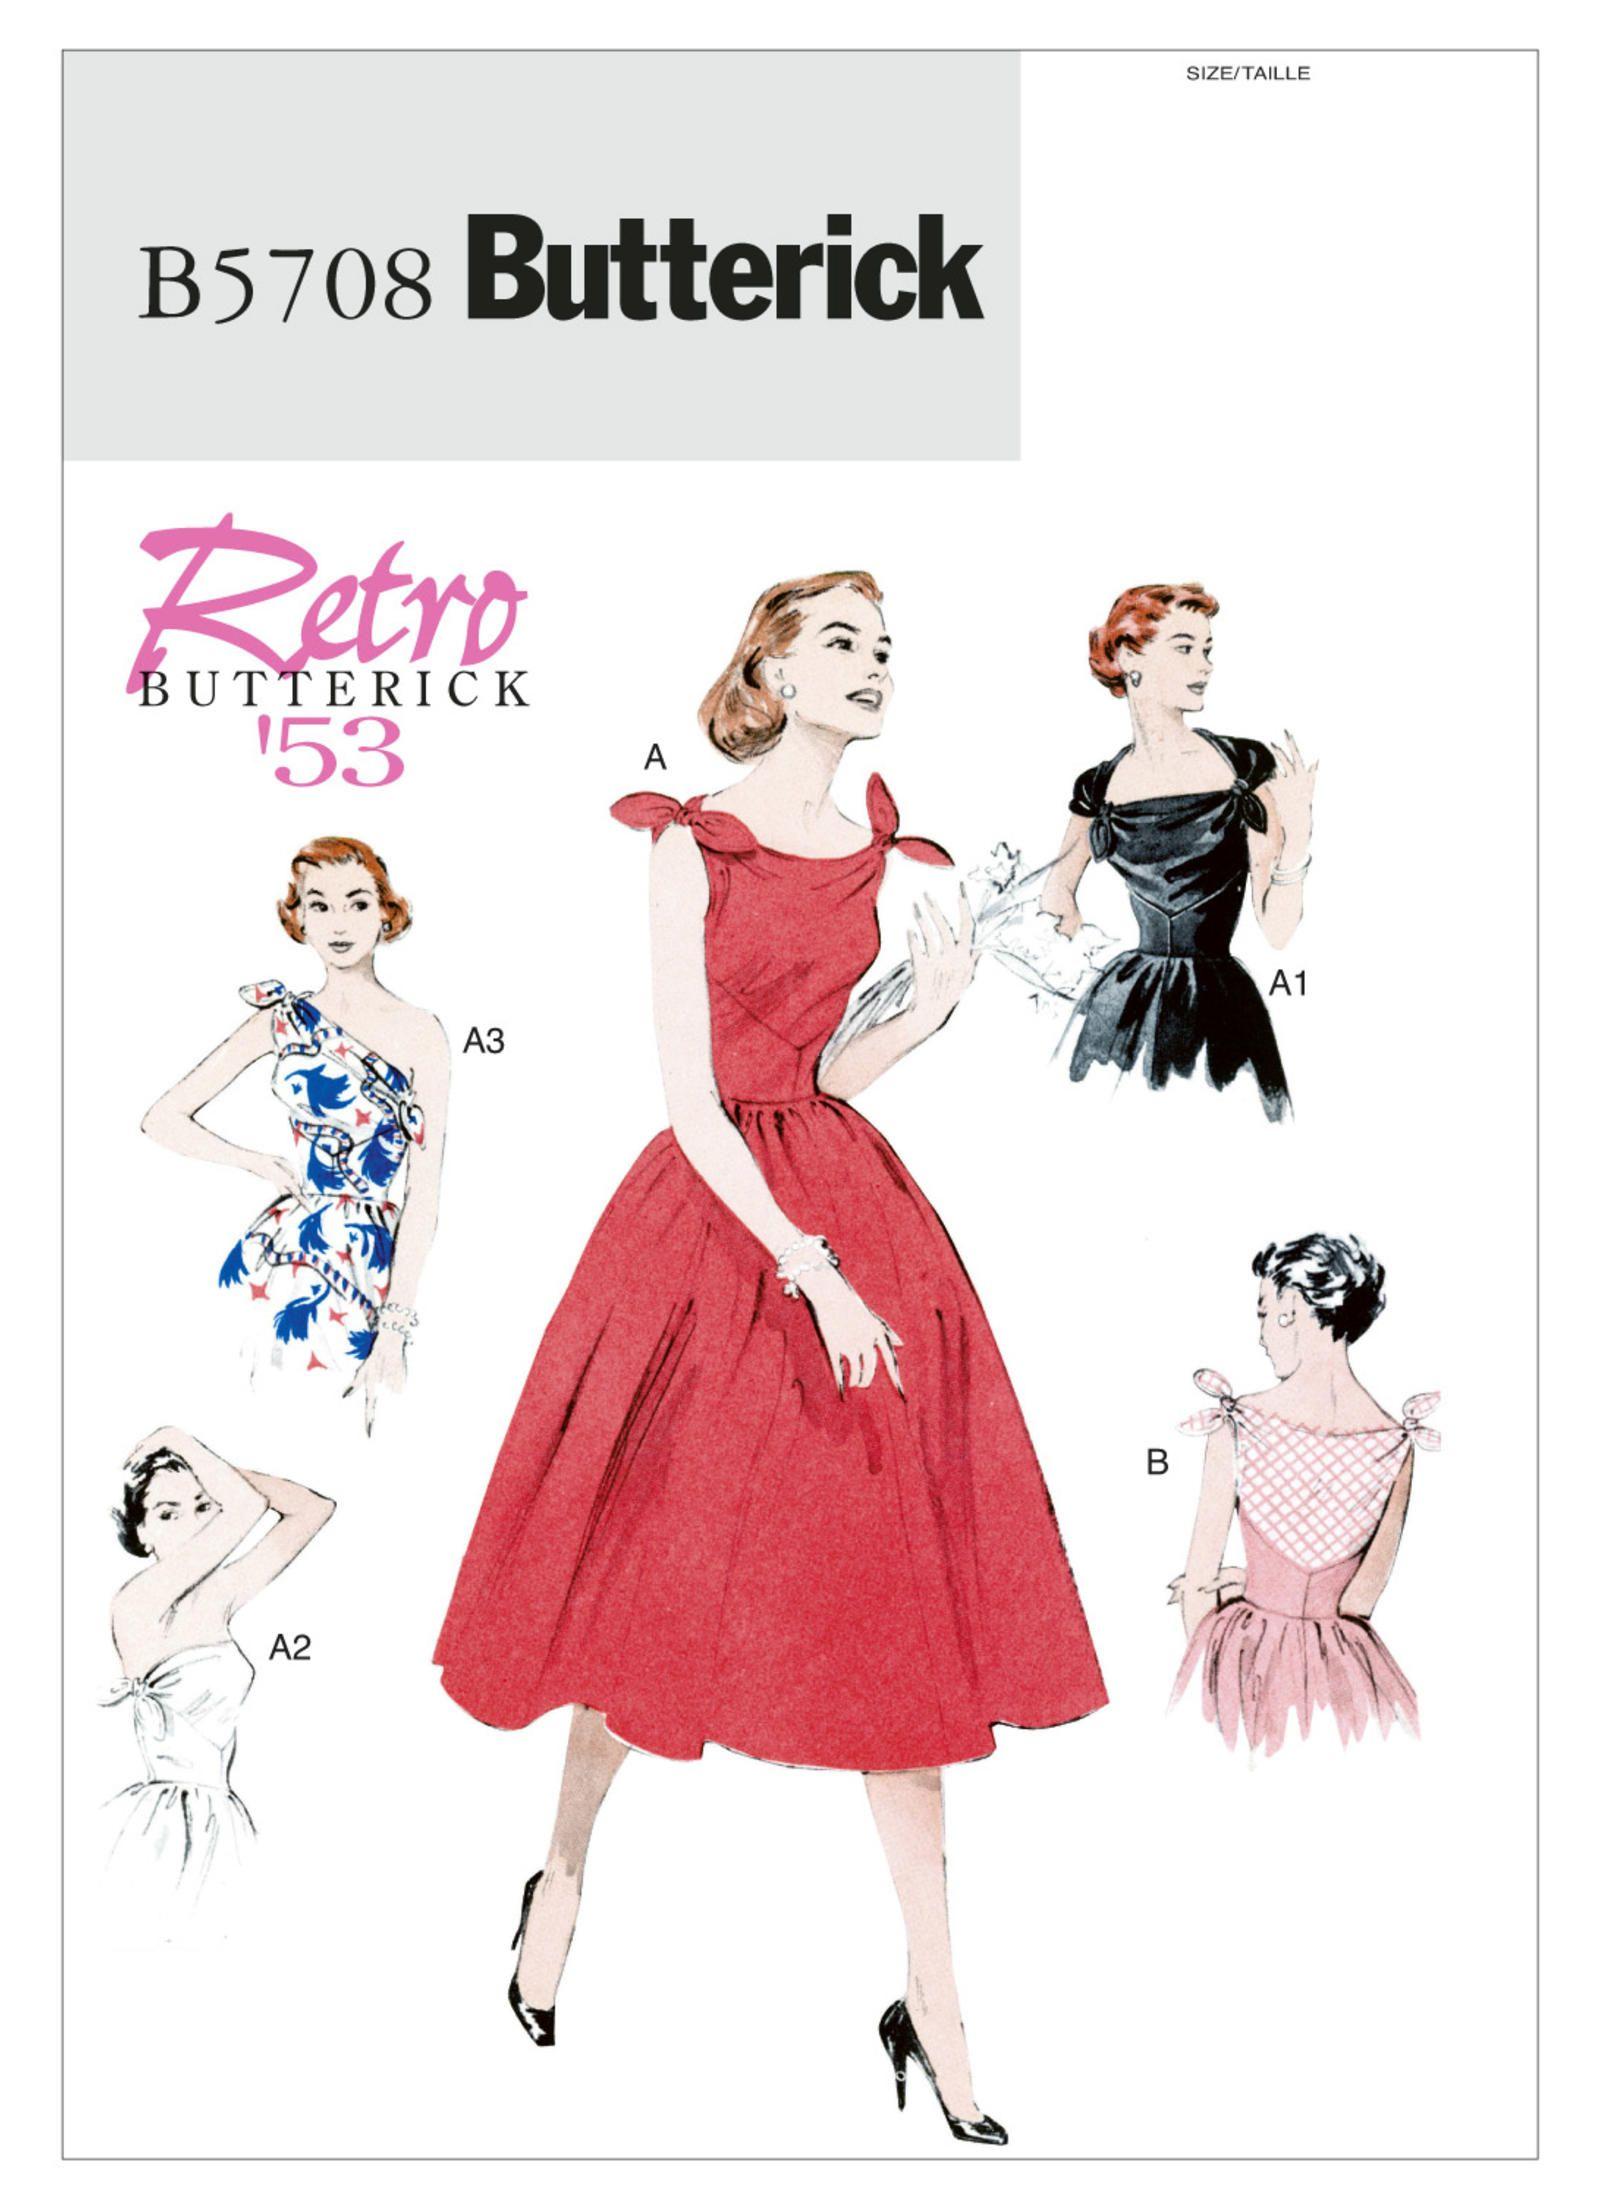 B5708 | Sewing Patterns to buy | Pinterest